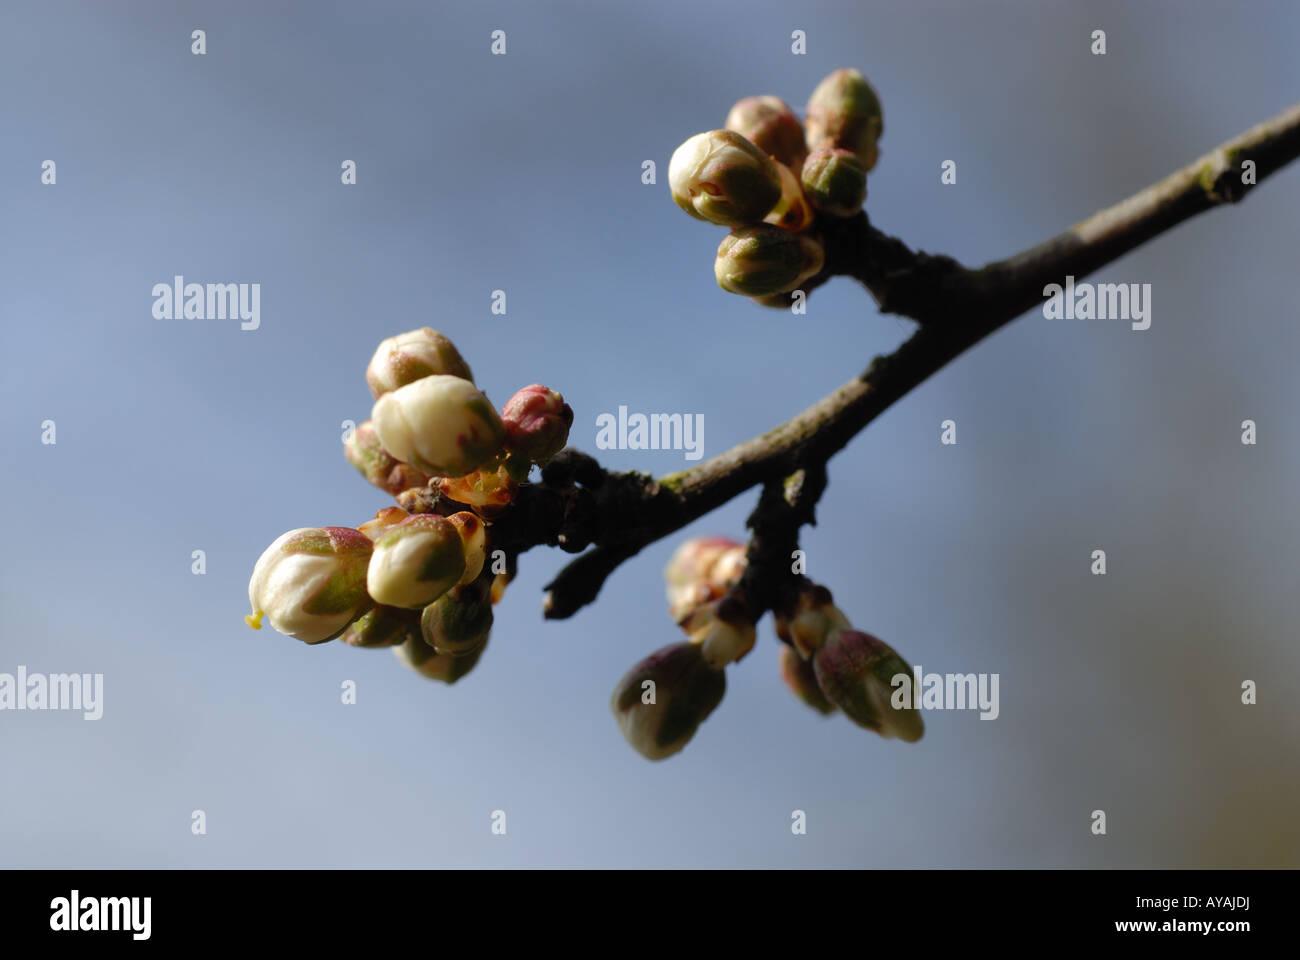 Cherry buds - Stock Image